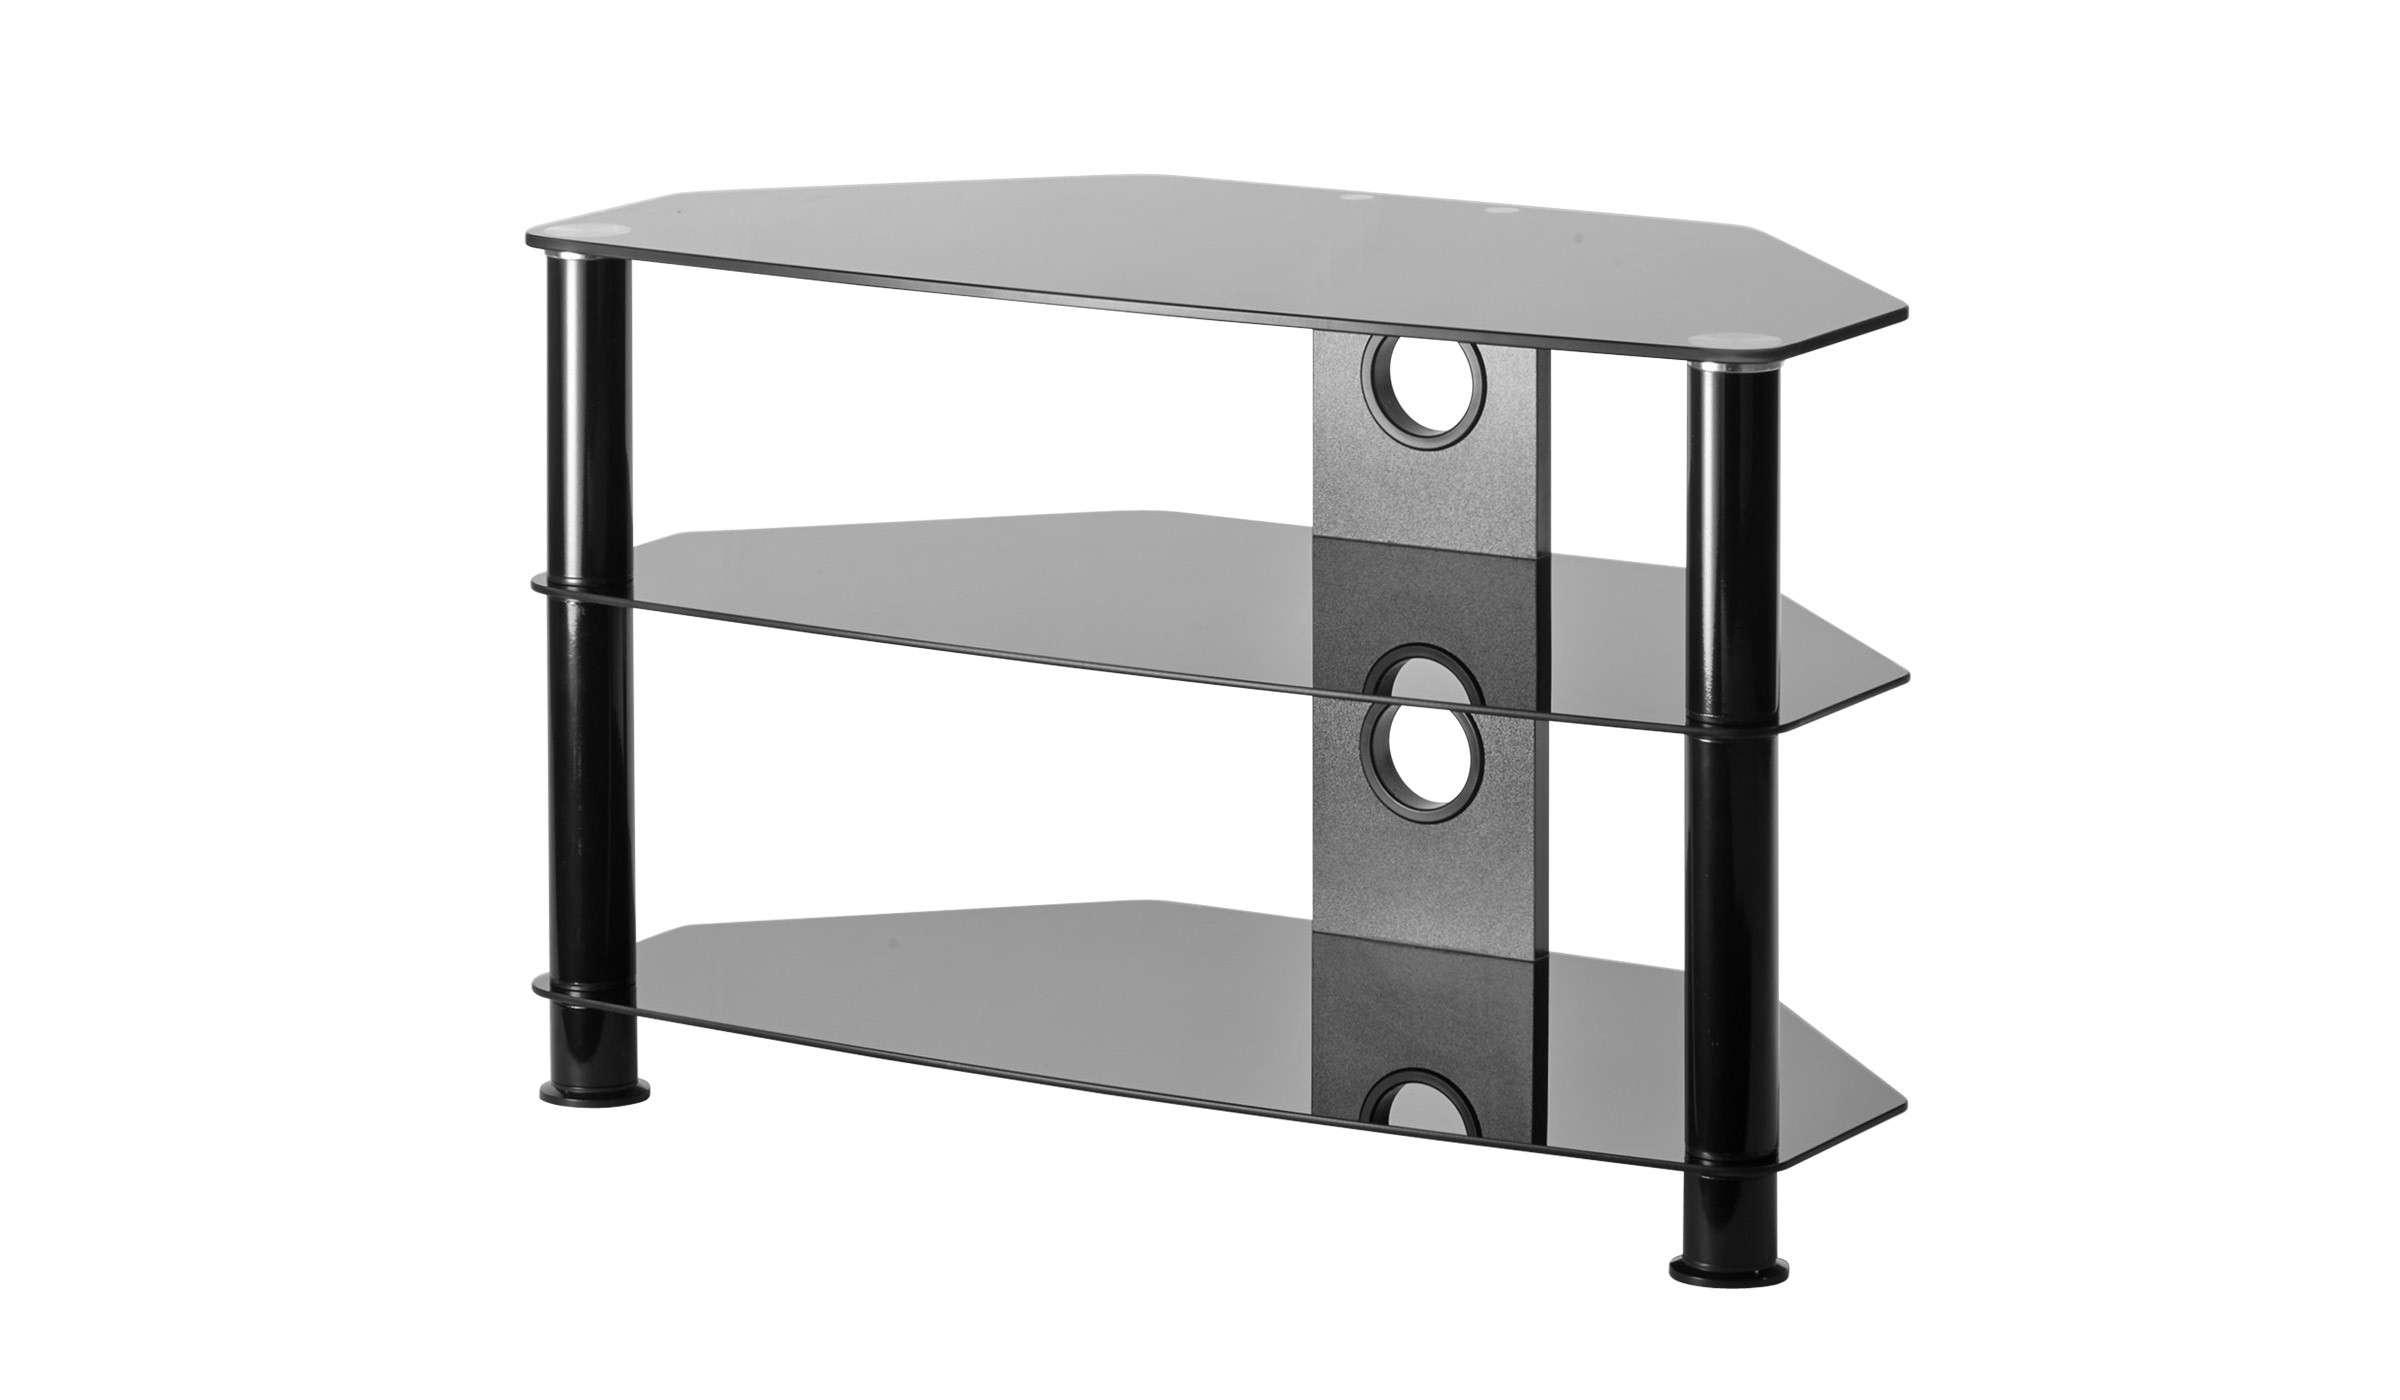 Black Glass Corner Tv Stand Up To 37 Inch Tv | Mmt Db800 Inside Black Corner Tv Cabinets (View 16 of 20)